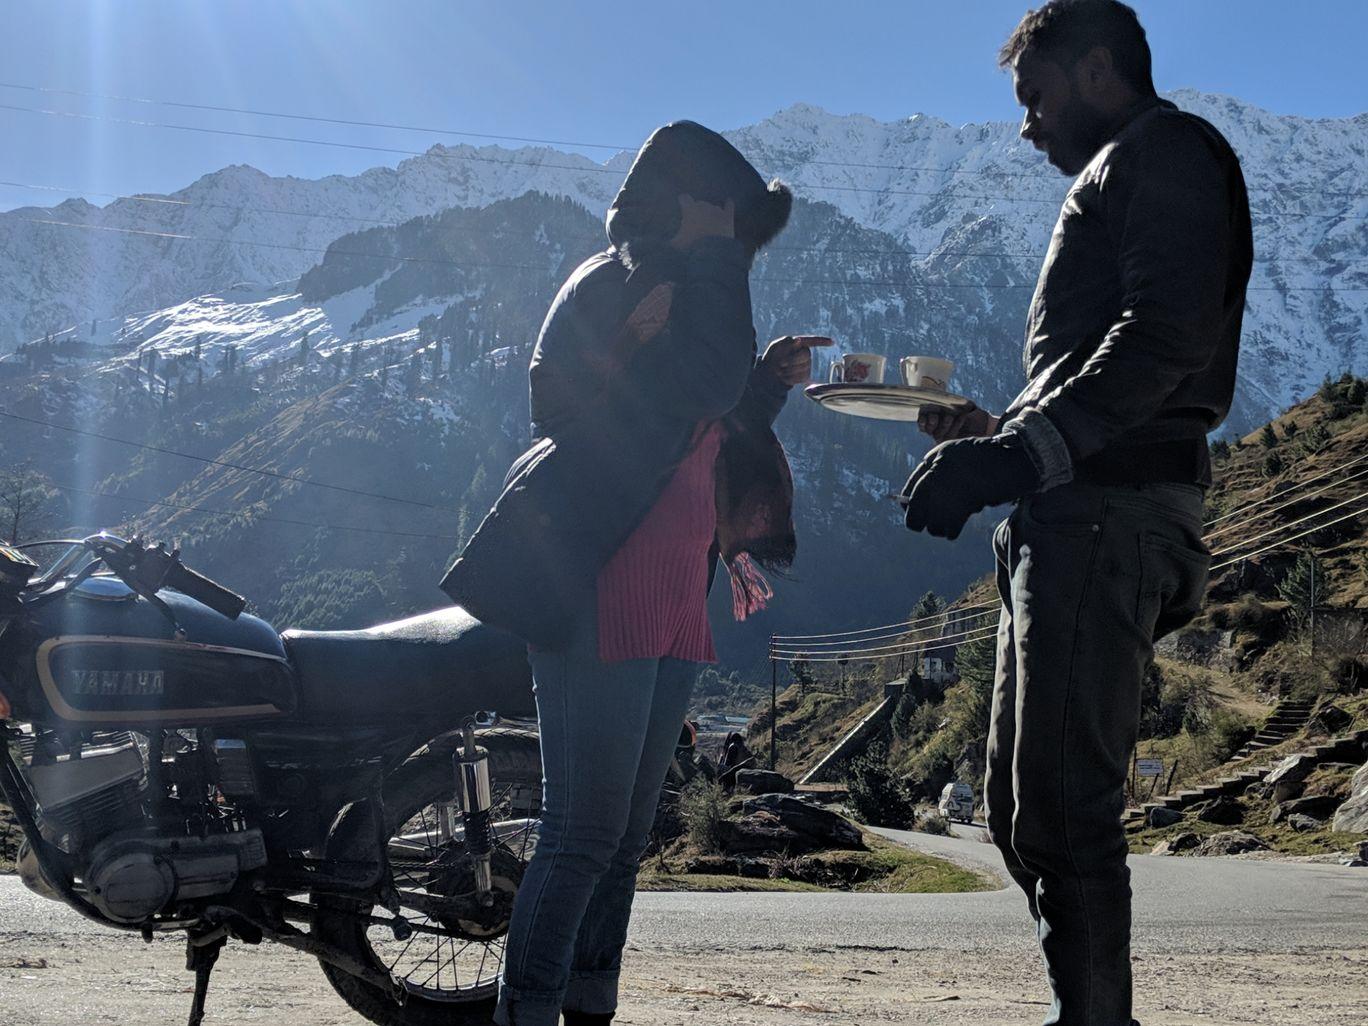 Photo of Himachal Pradesh By Albin Philip